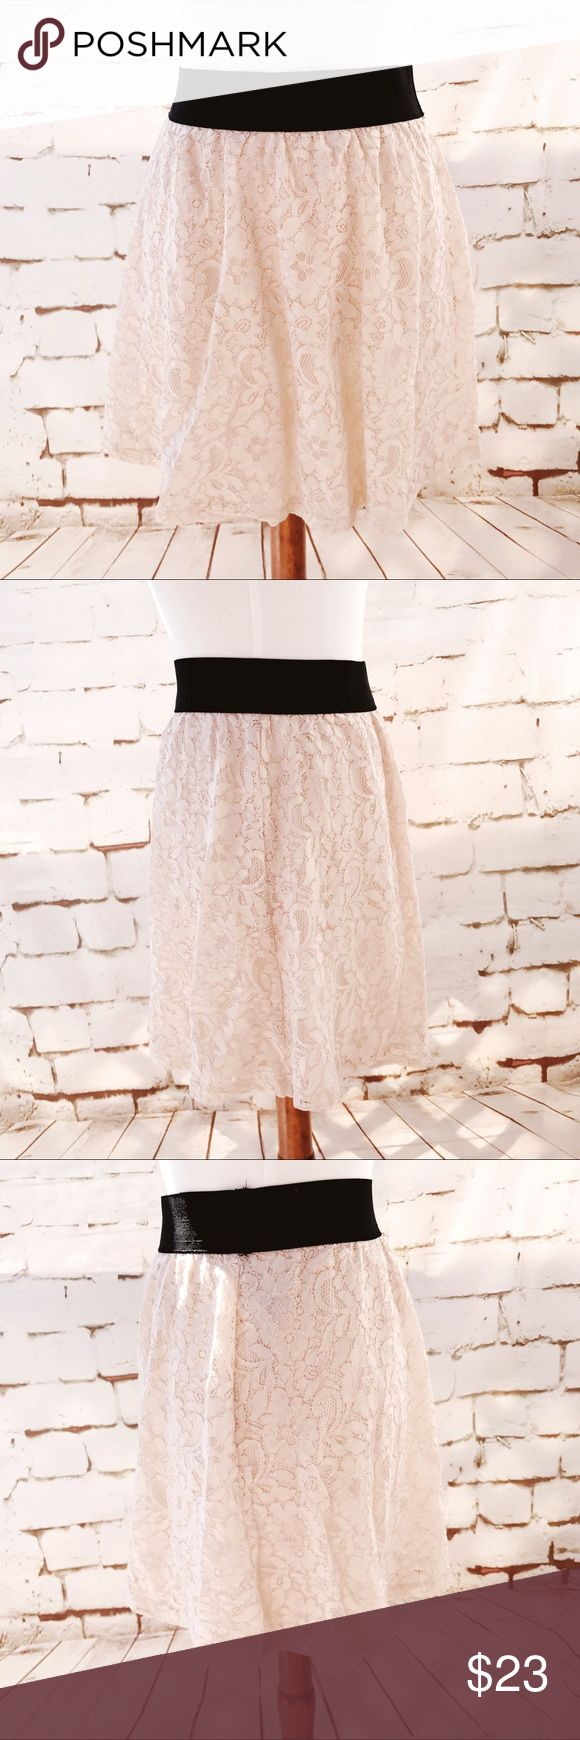 Forever 21 Pail Pink Lace Mini Skirt Forever 21 Pail Pink Lace Mini Skirt.  See pictures for material and measurements Forever 21 Skirts Mini